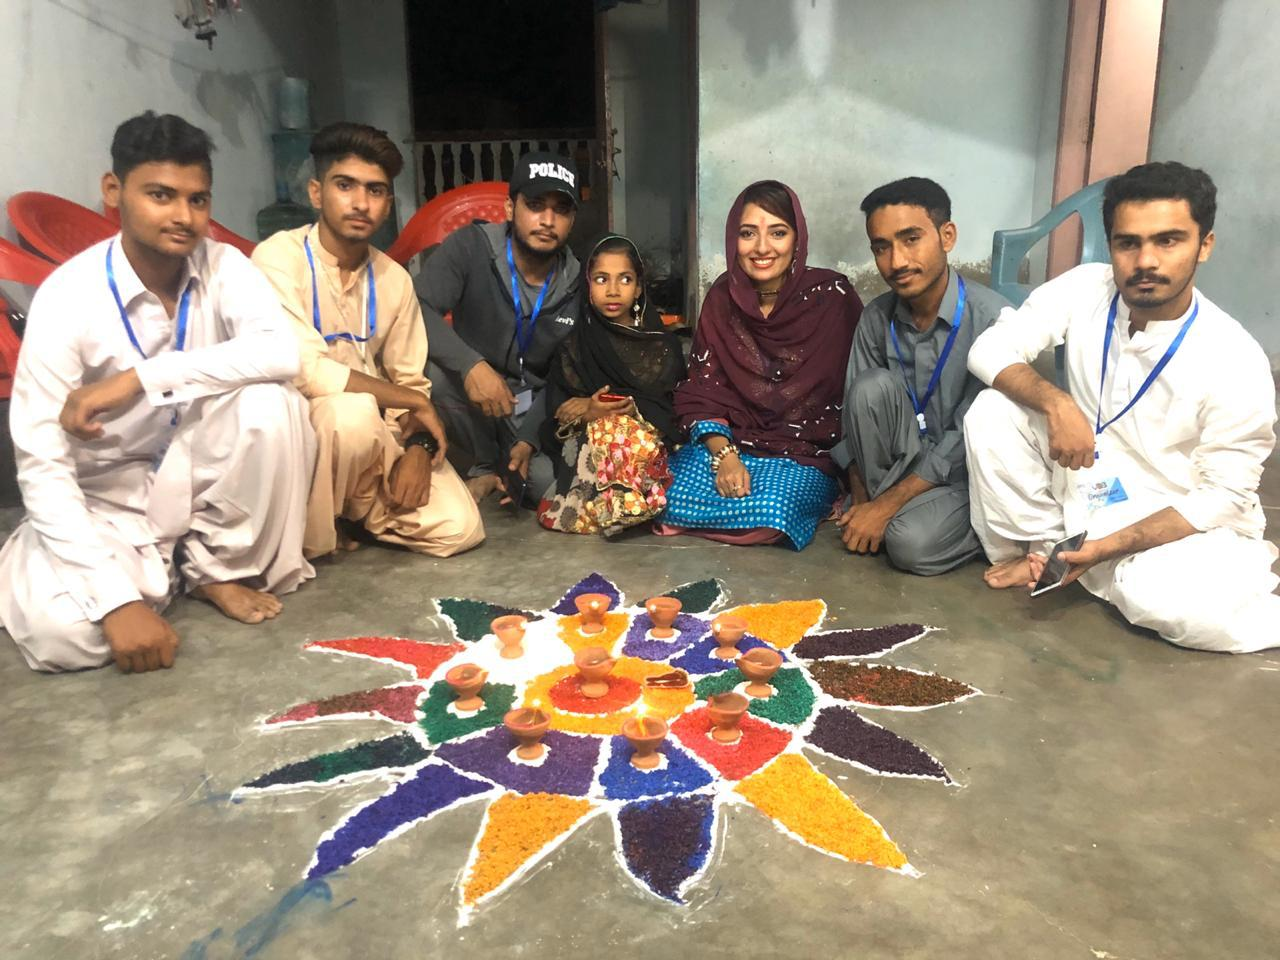 Wishes for Happy Diwali: People of Hindu Community in Balochistan Celebrating Diwali Festival